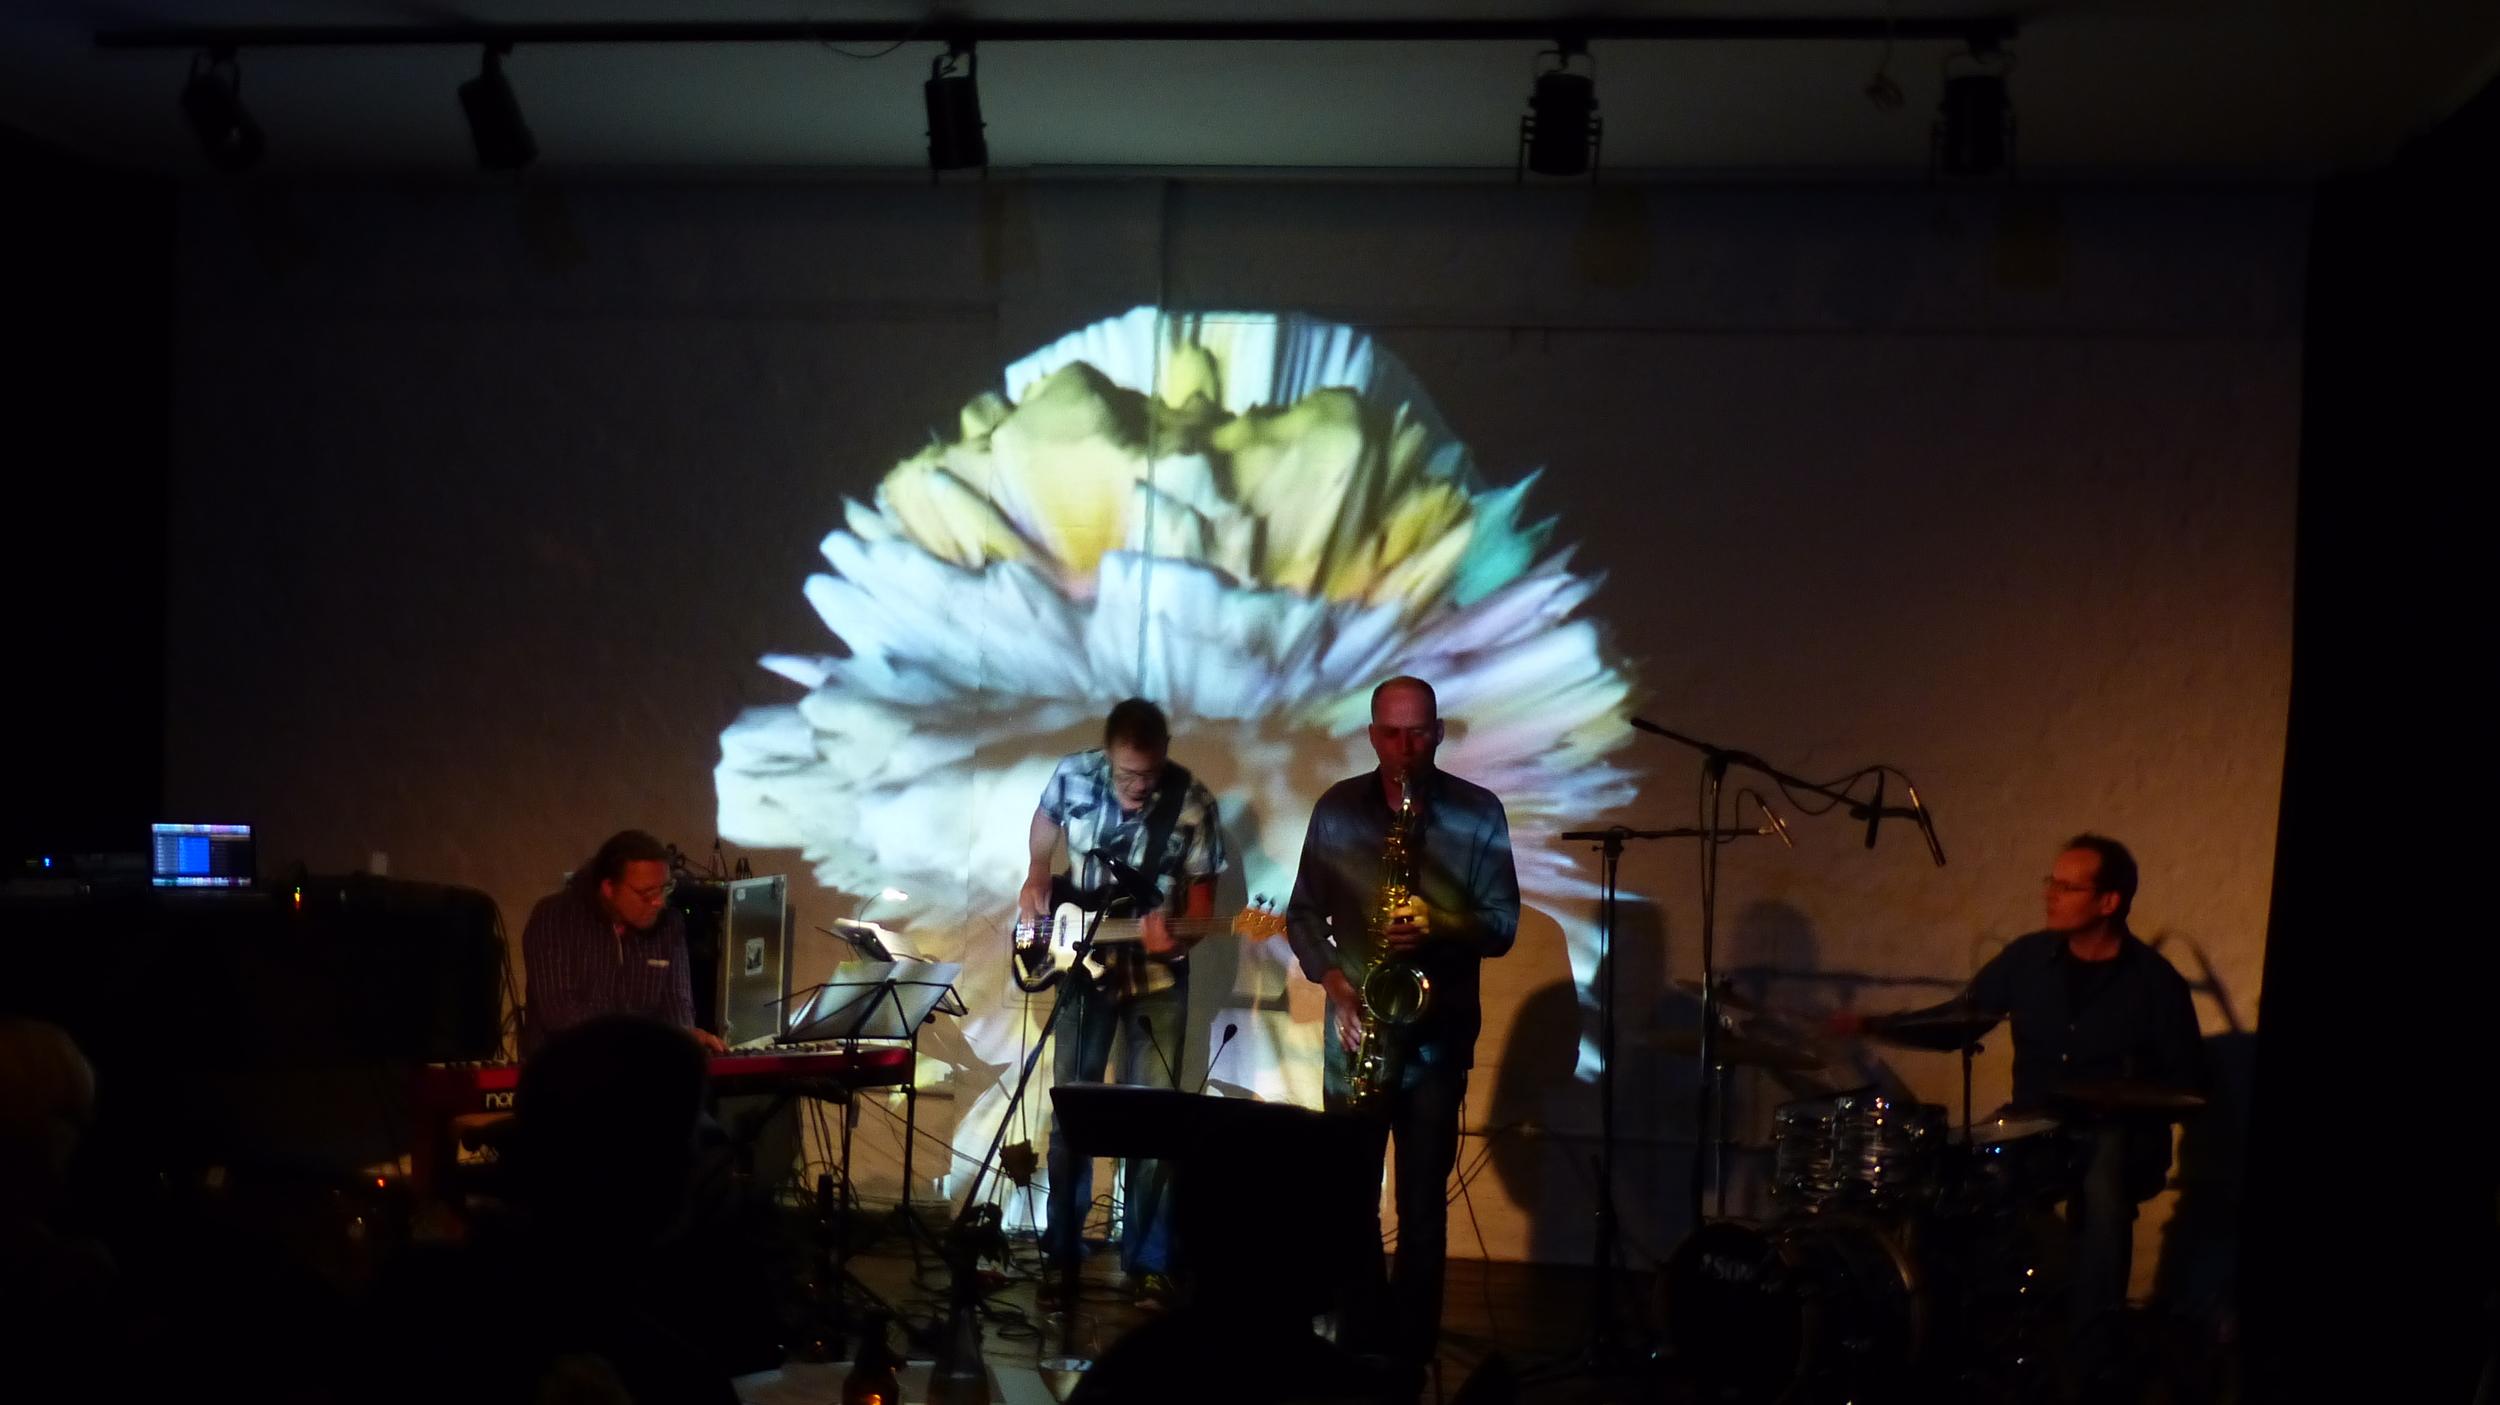 2015 - Video Installation - Andre Enthöfers Soundscapes II